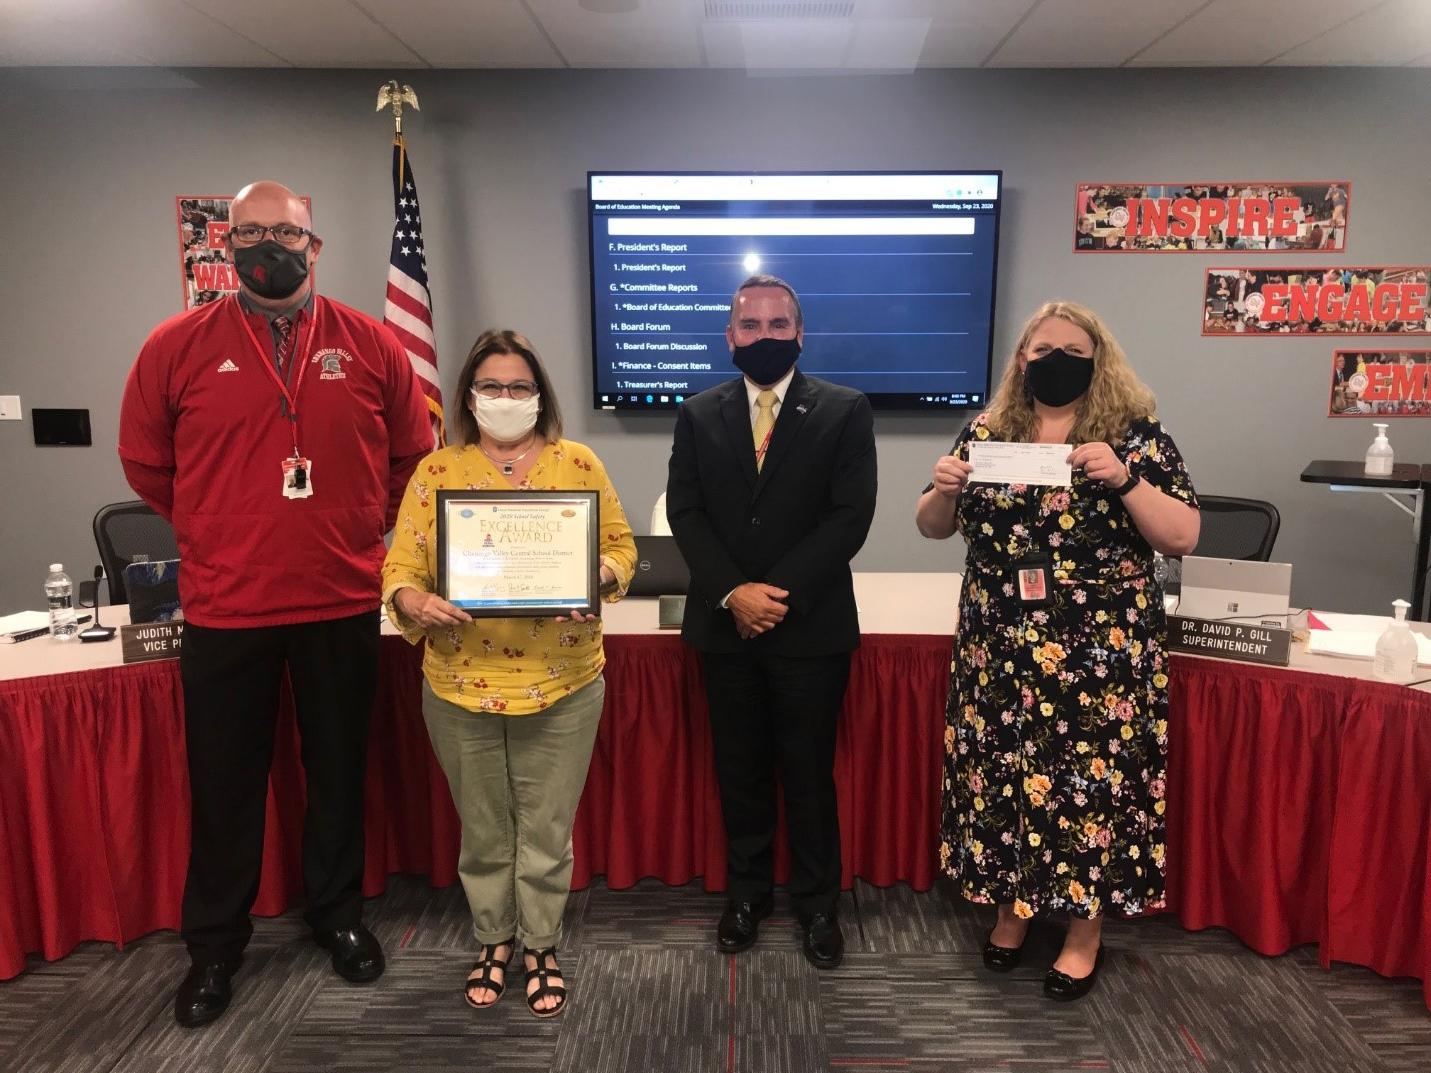 Chenango Valley representatives with school safety award